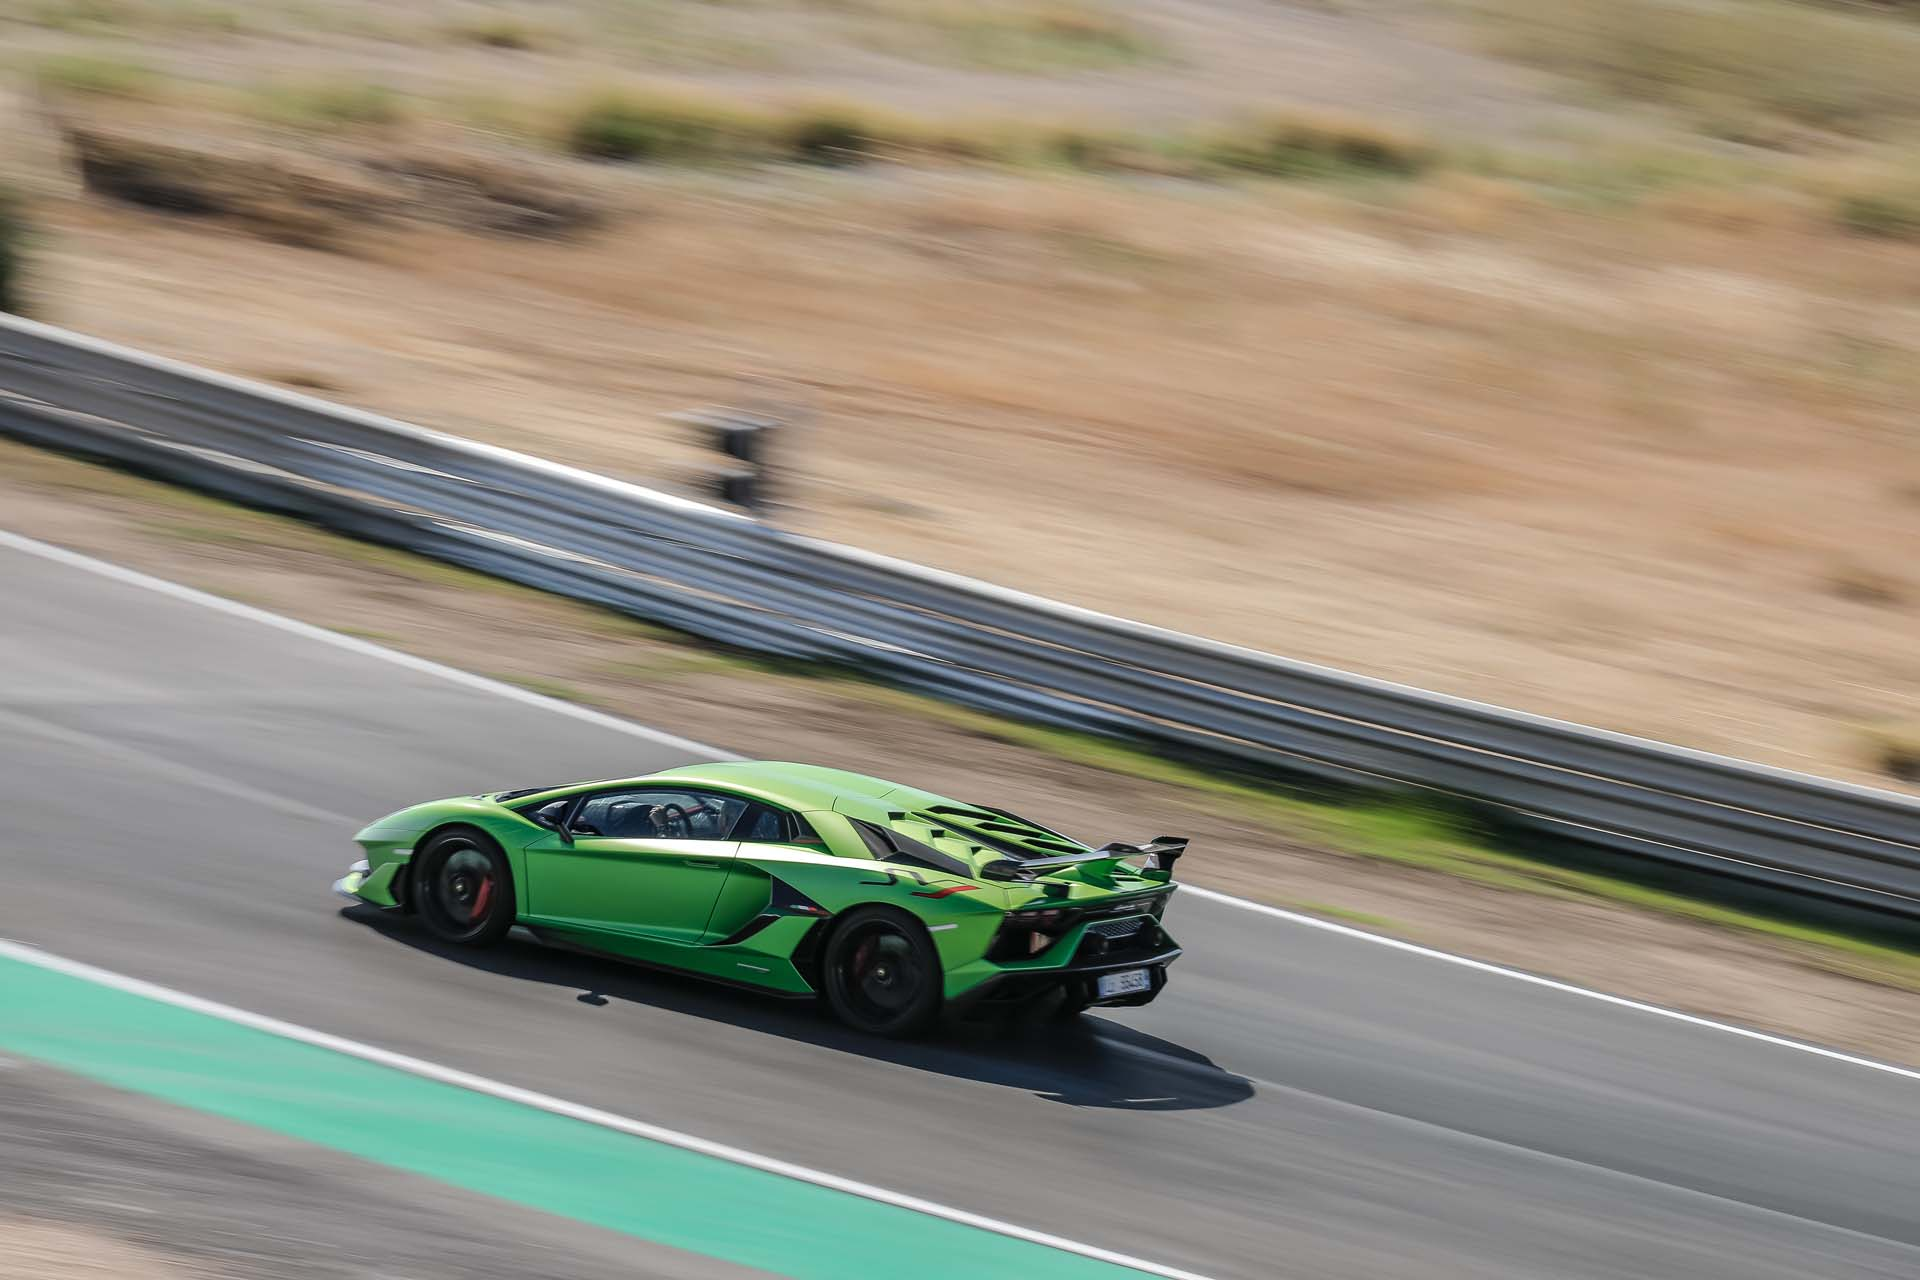 2019 Lamborghini Aventador SVJ Side Wallpapers #42 of 241